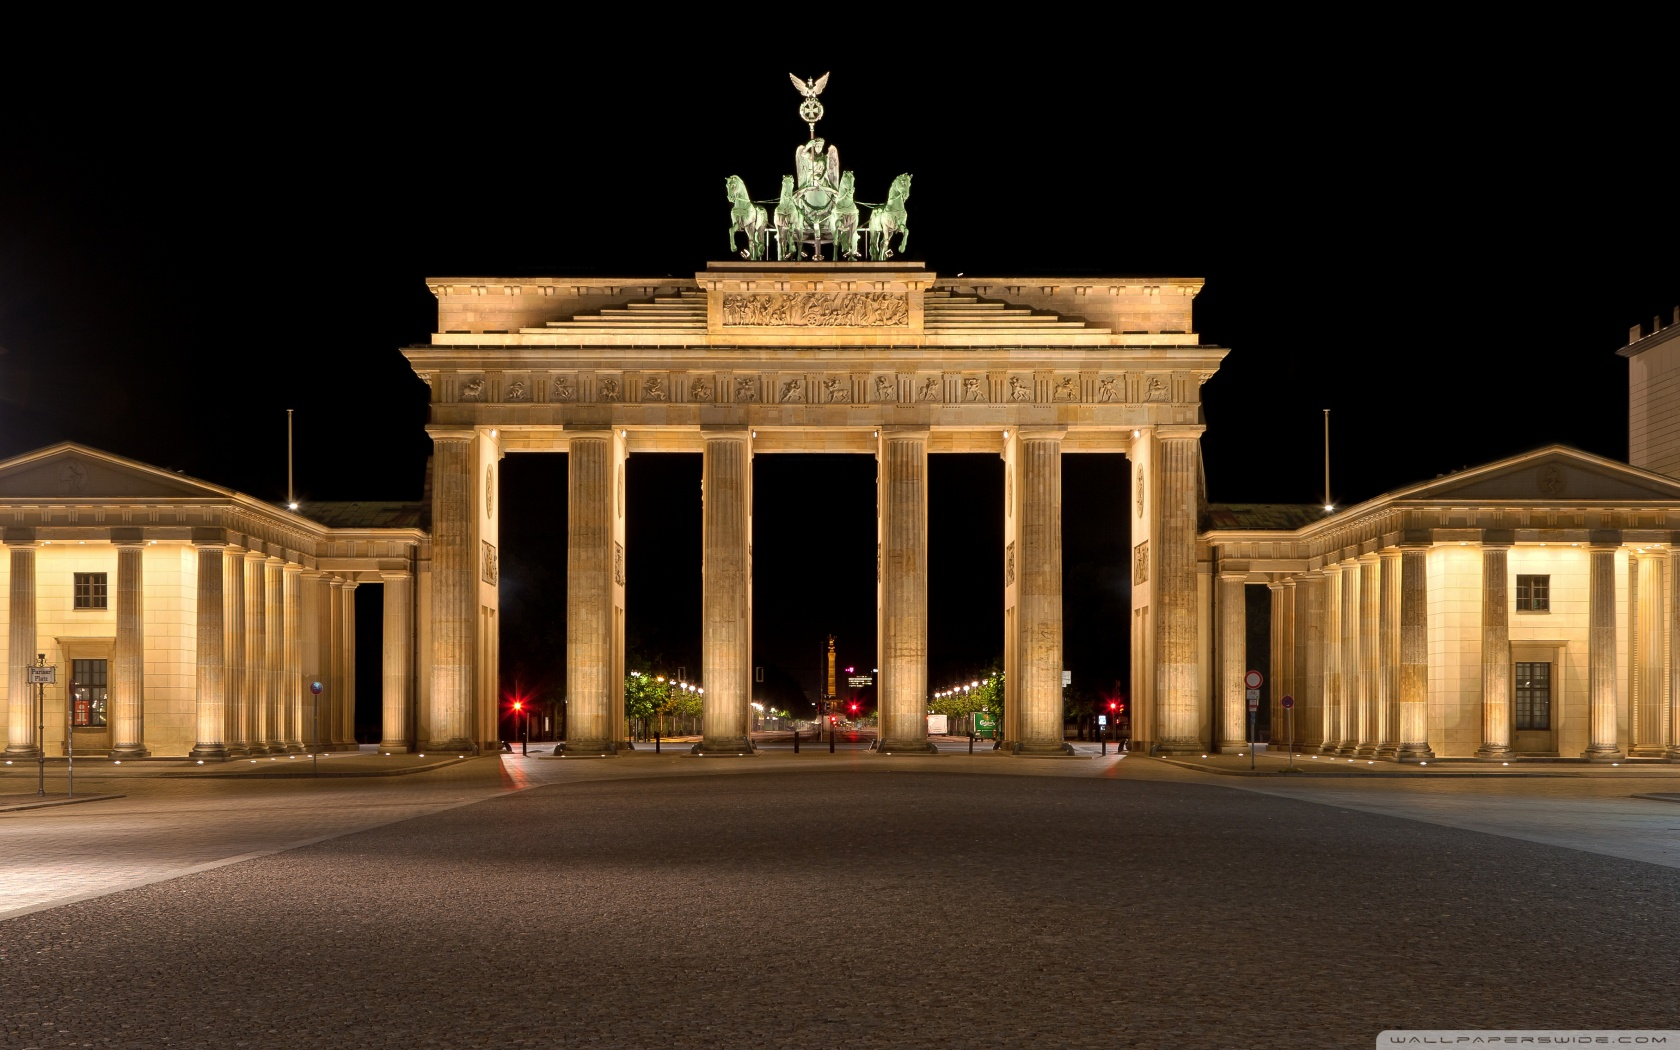 Brandenburg Gate 4K HD Desktop Wallpaper for 4K Ultra HD TV 1680x1050